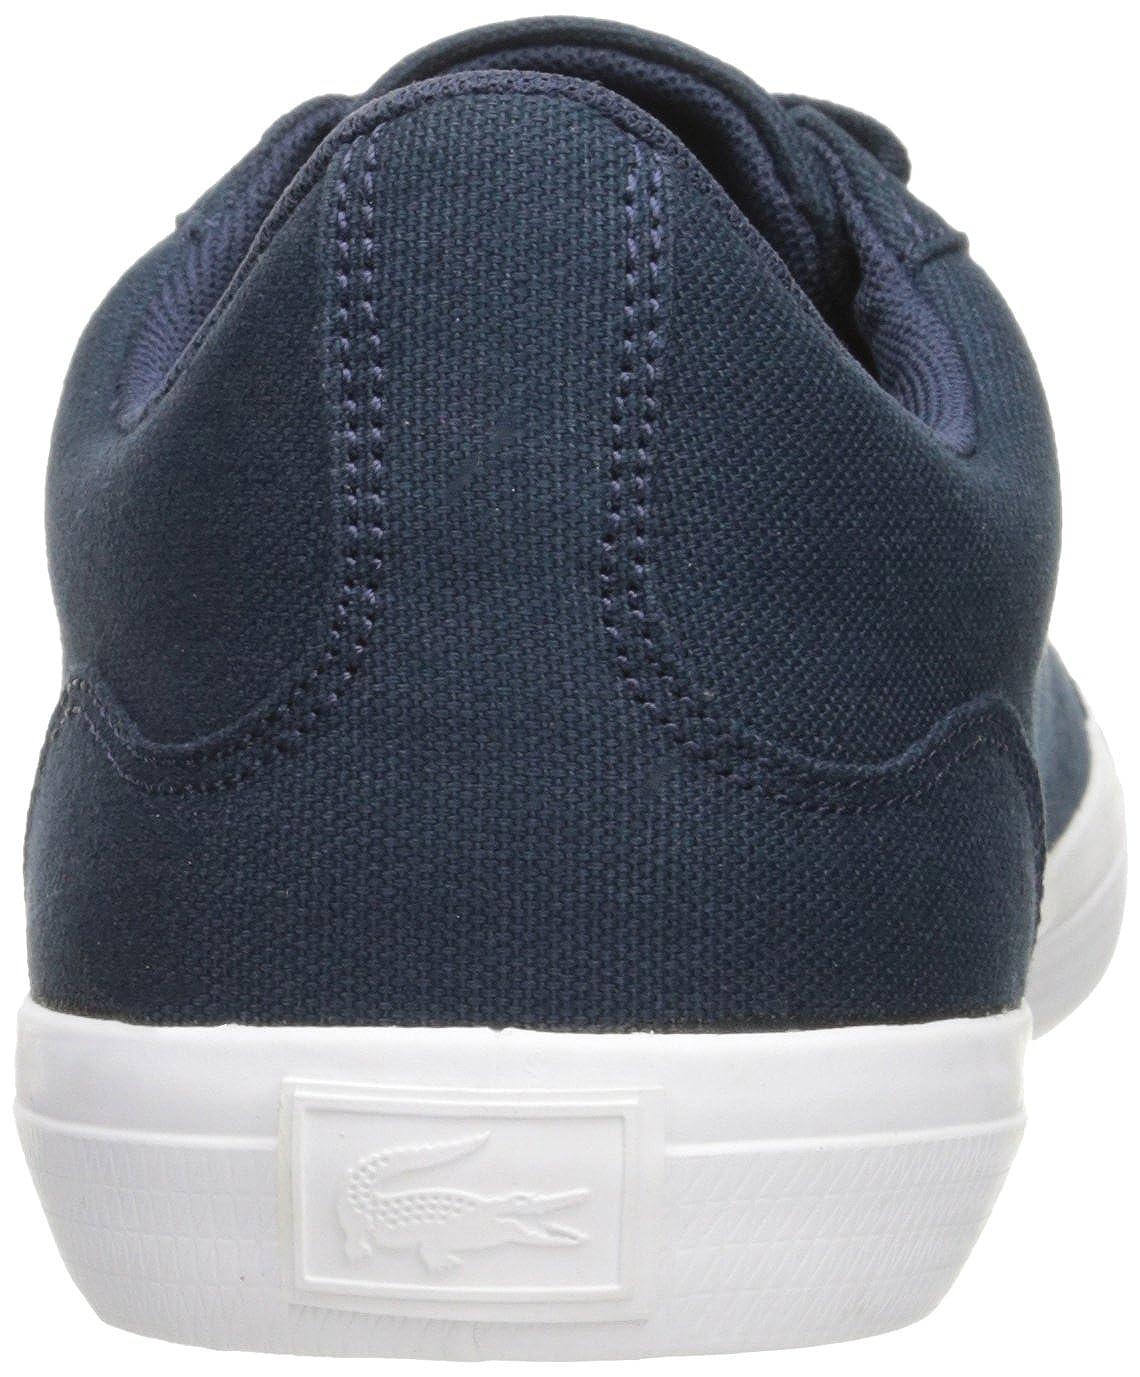 Lacoste Lerond Fashion Sneaker Men